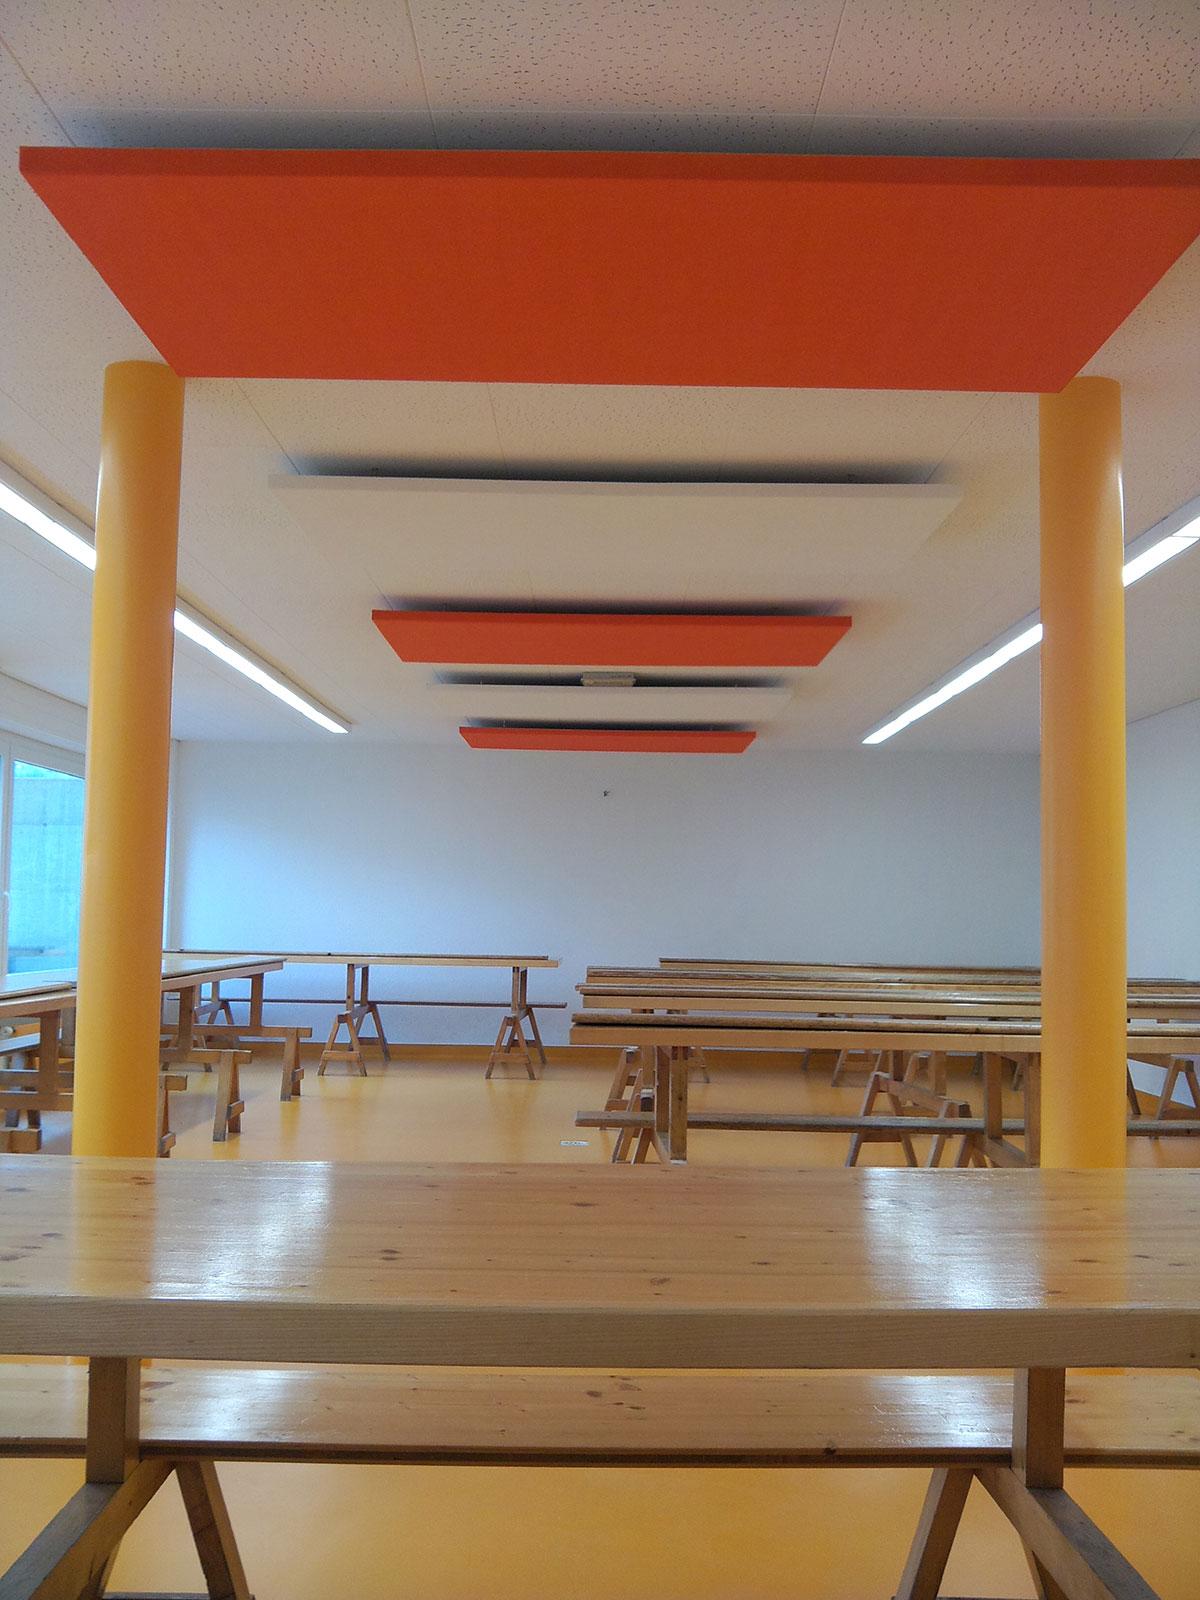 absopanel decorative sound absorbing panels ceiling sempatap. Black Bedroom Furniture Sets. Home Design Ideas